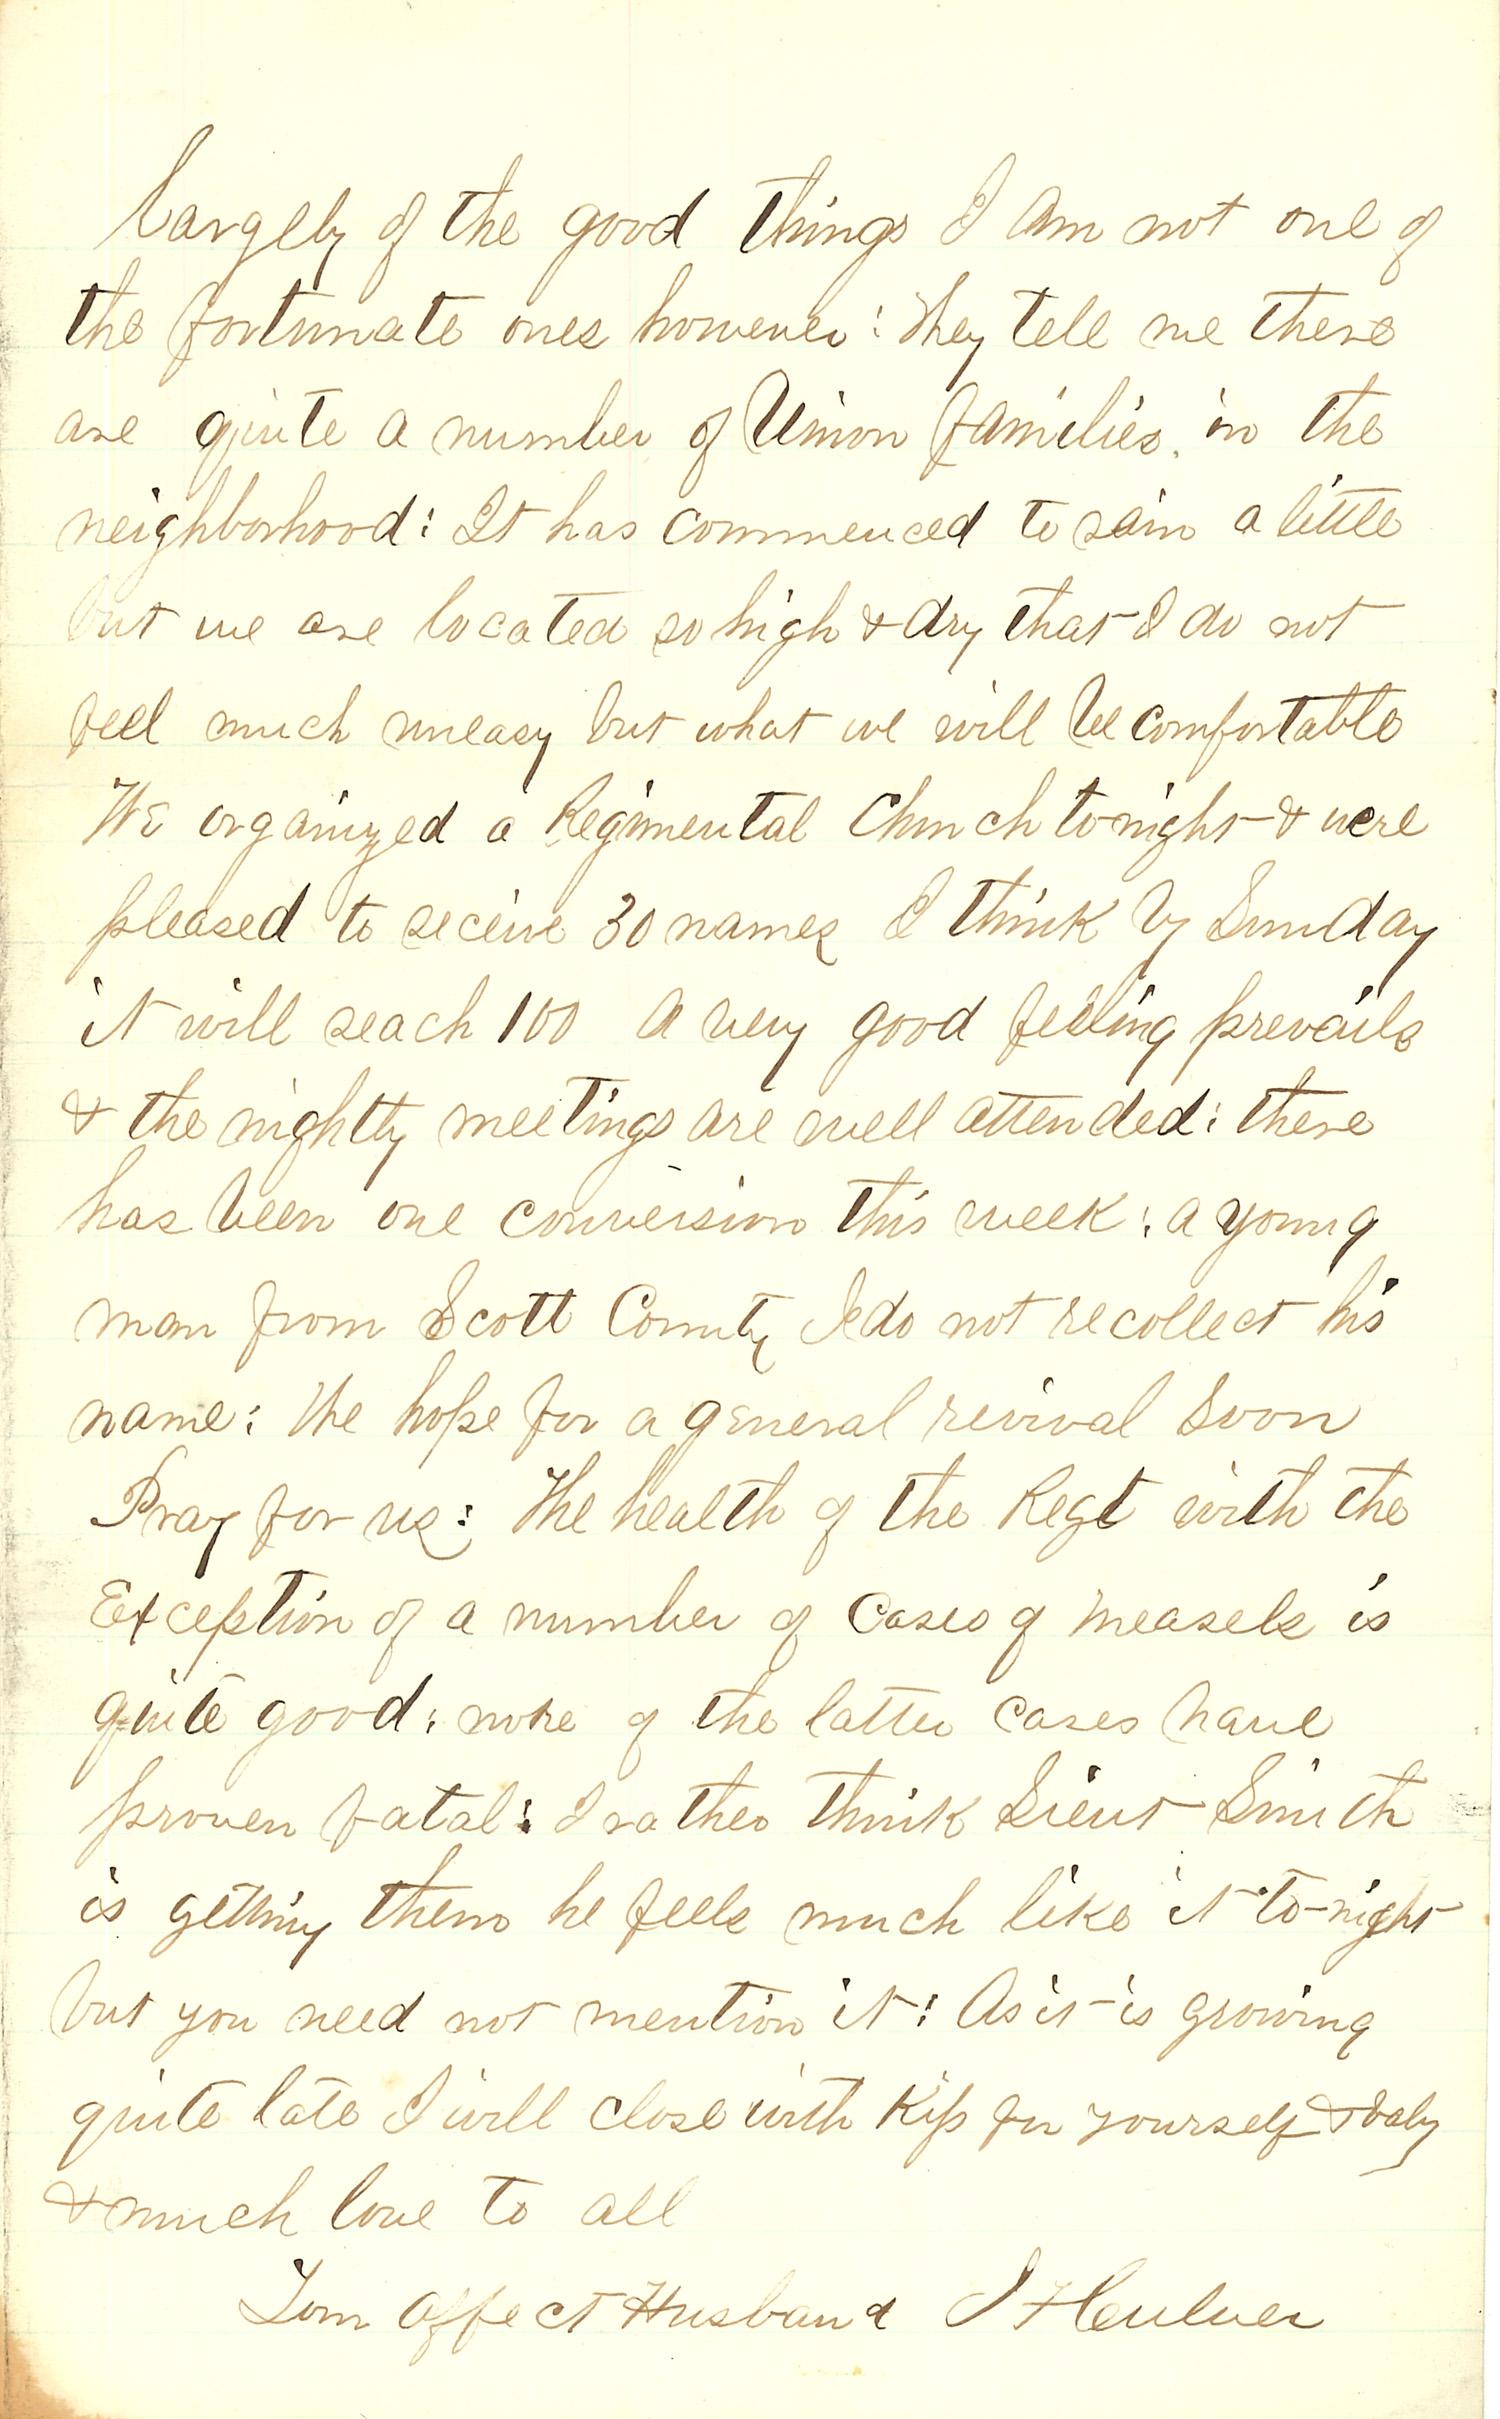 Joseph Culver Letter, December 25, 1862, Letter 2, Page 3